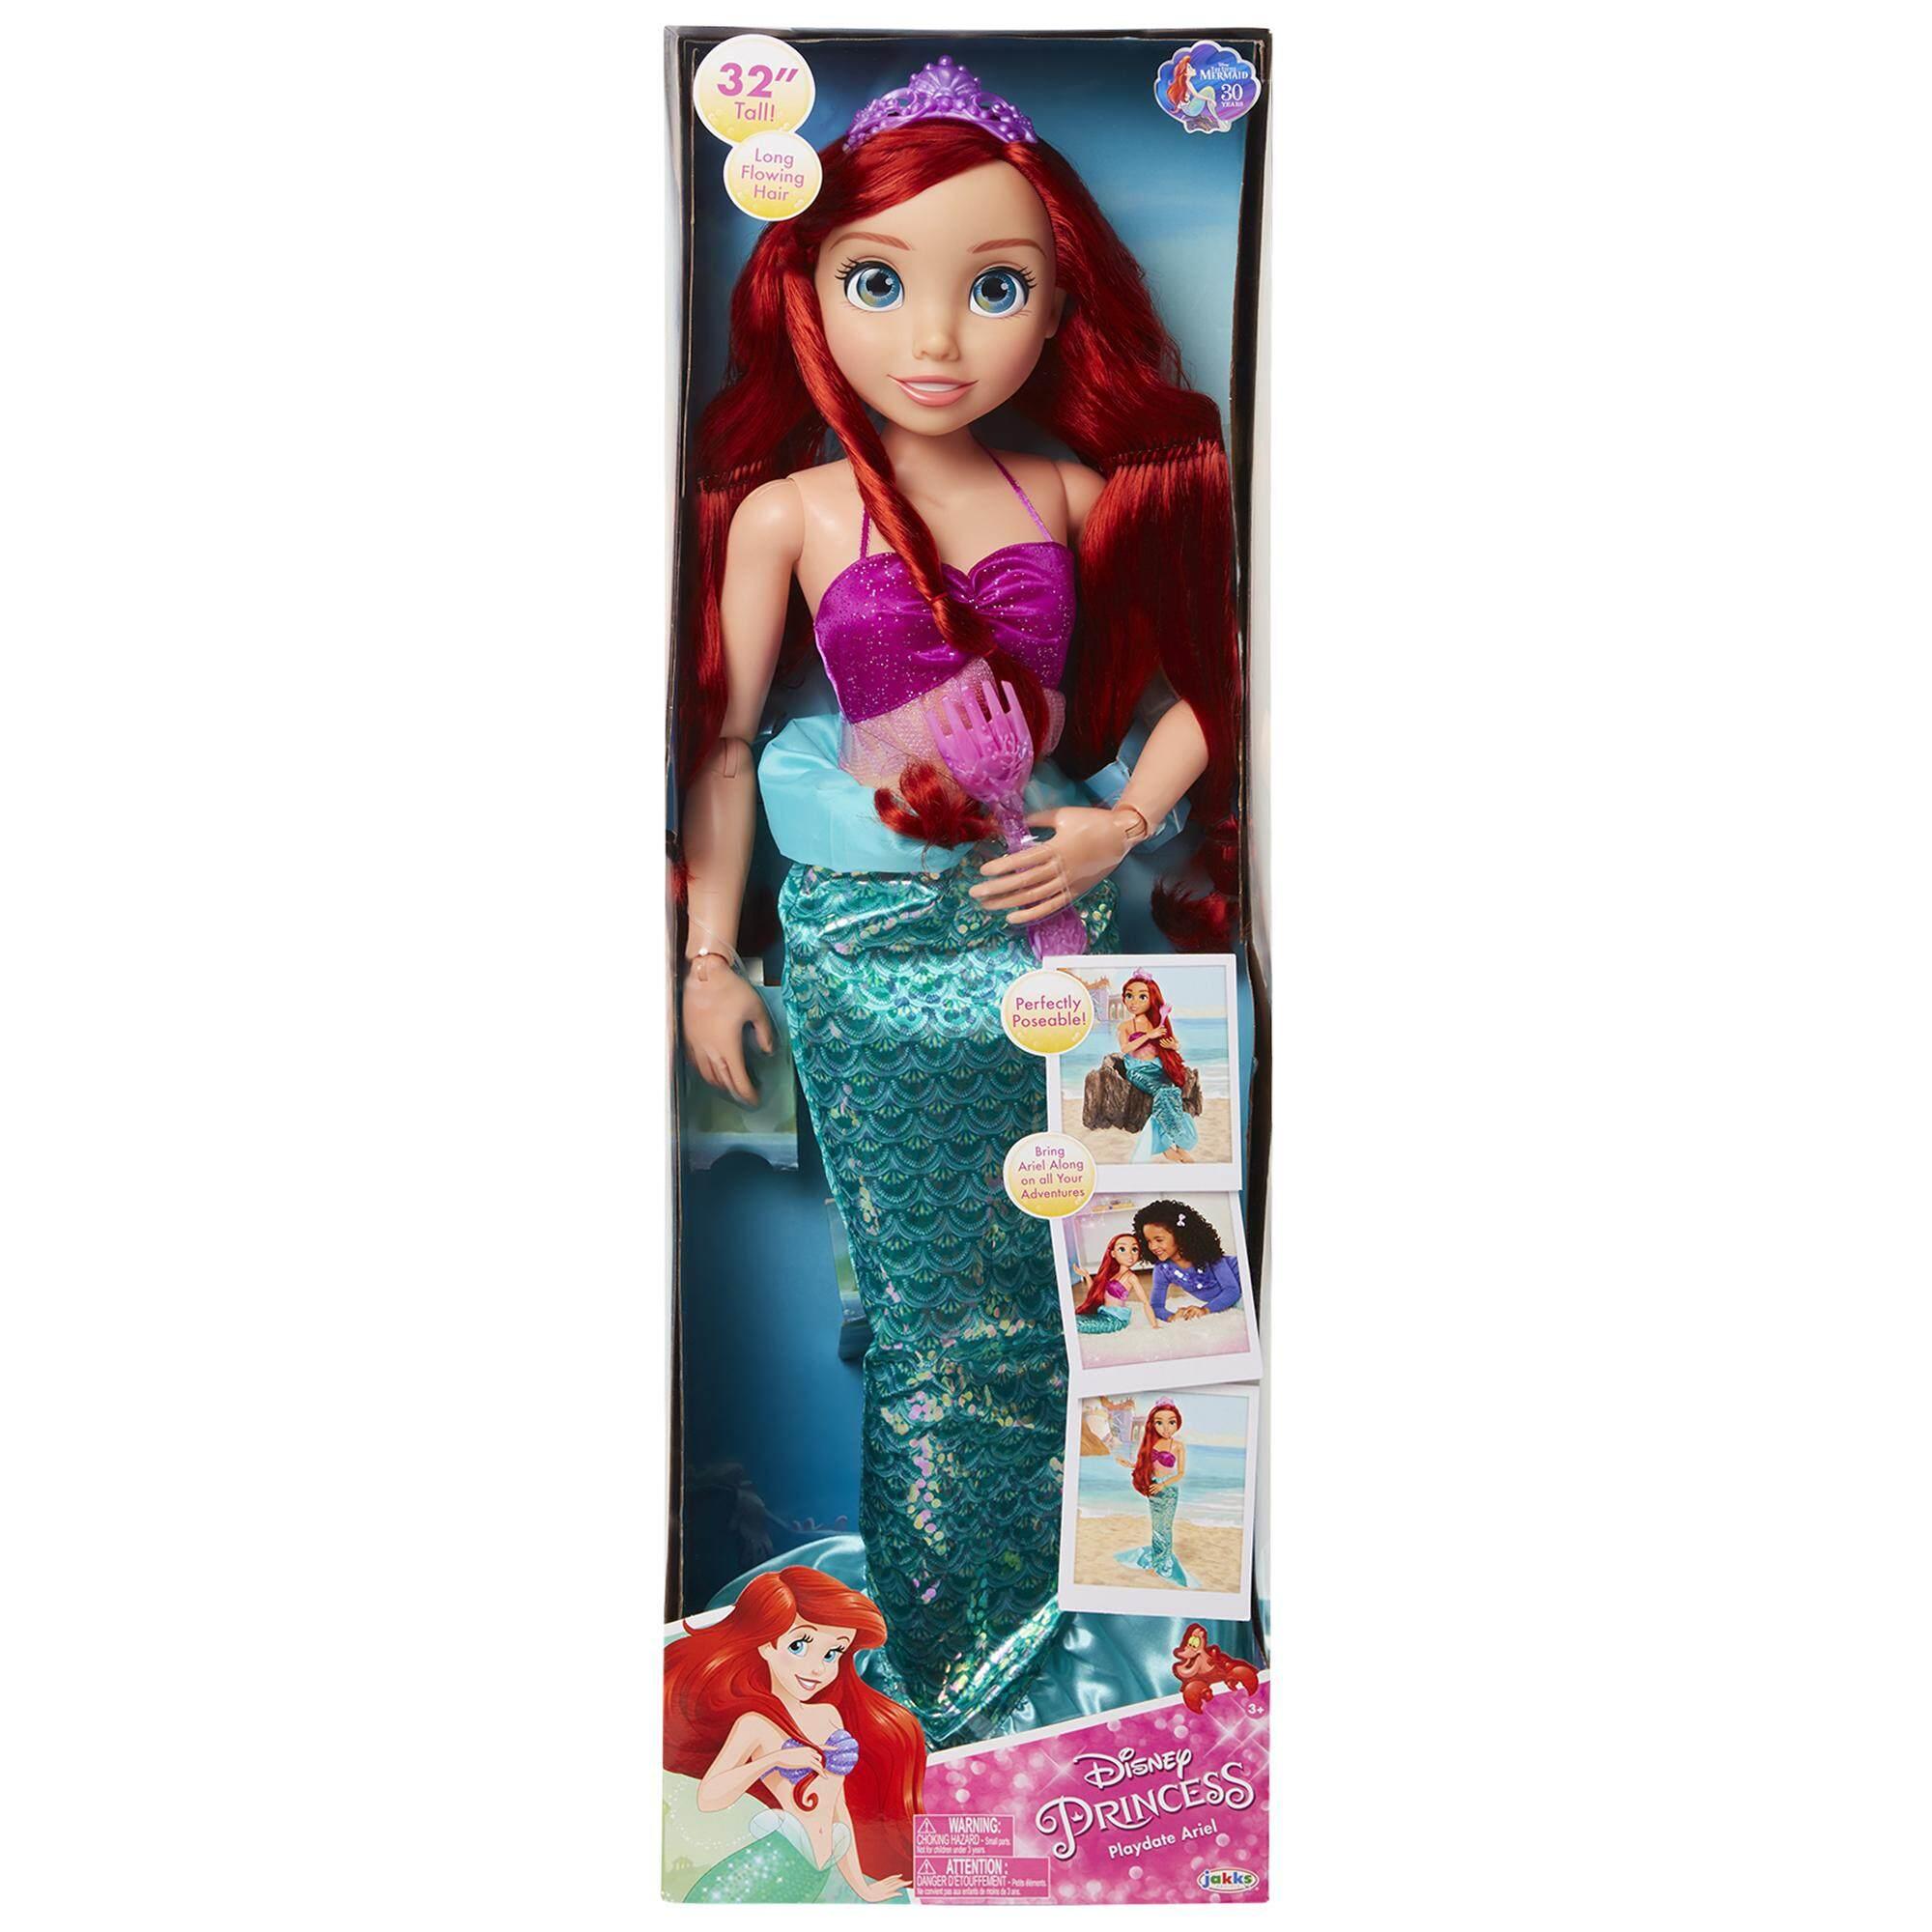 Disney Princess ตุ๊กตา 32 Playdate Ariel.